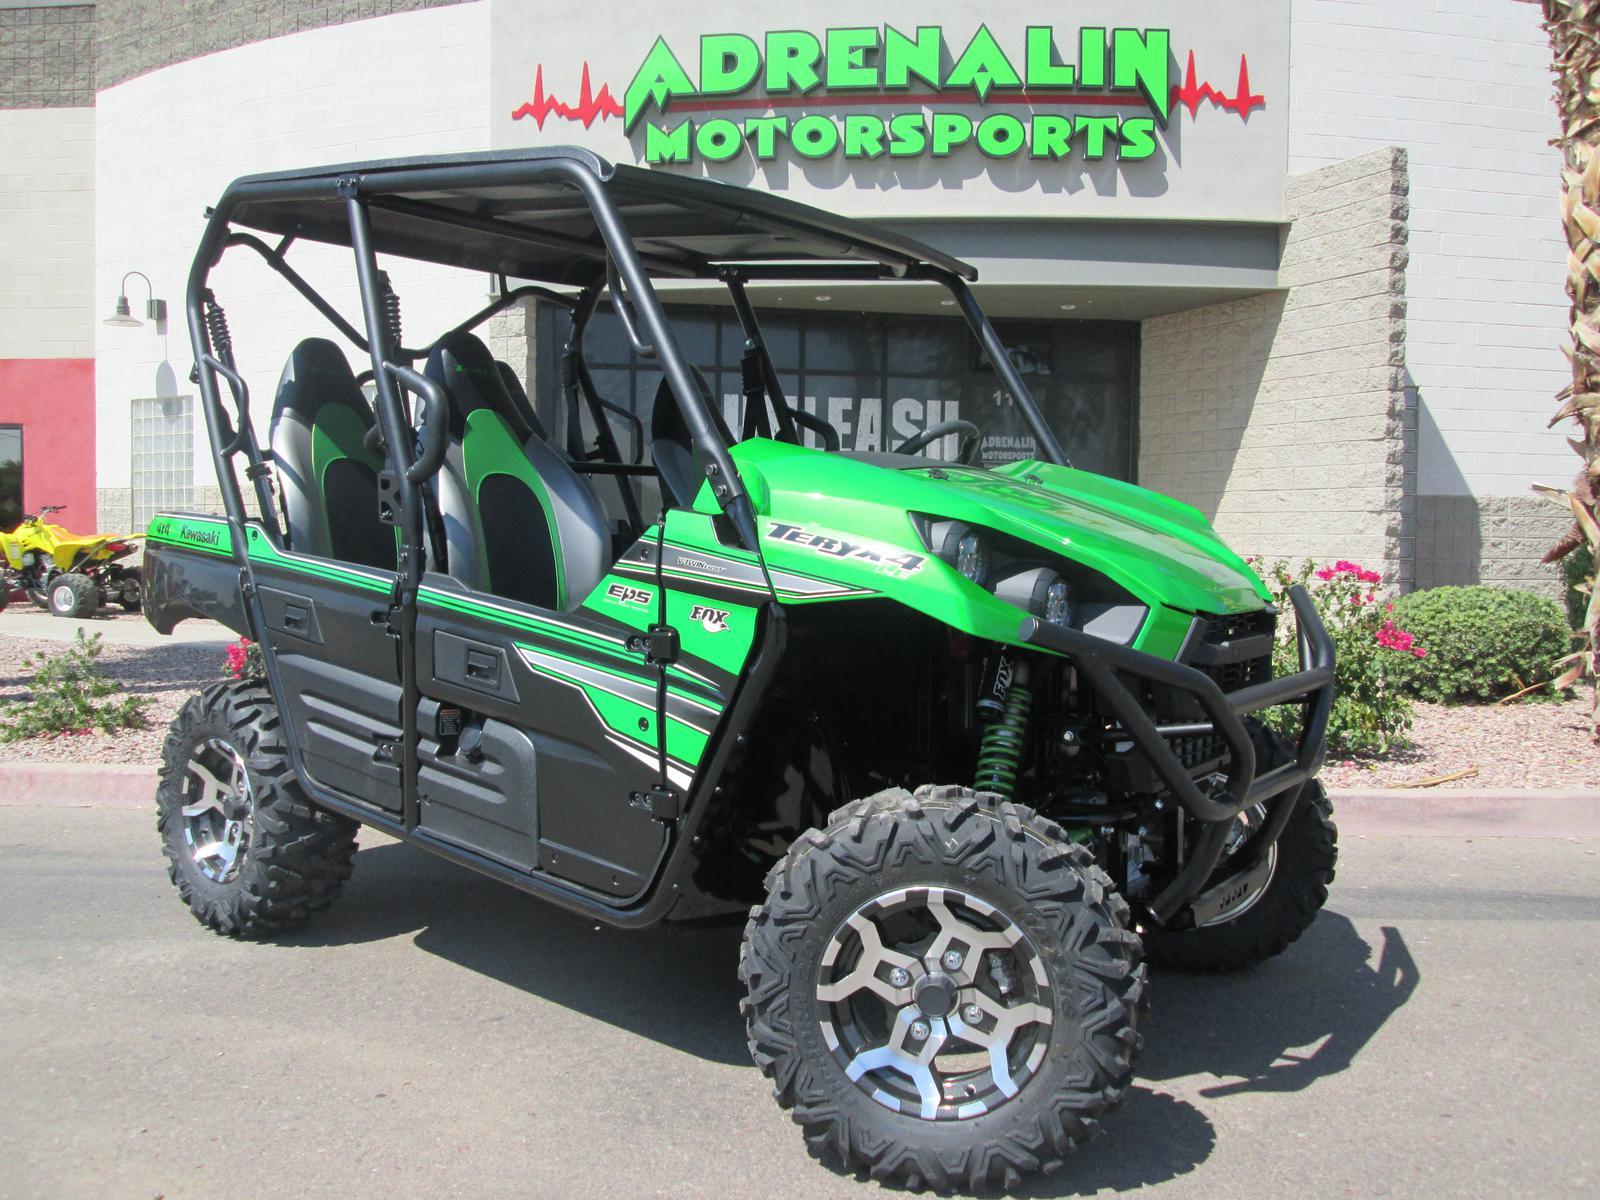 2018 Kawasaki TERYX 4 LE $3000 Savings End of Year Sale for sale in Casa  Grande, AZ | Adrenalin Motorsports 520-836-0583